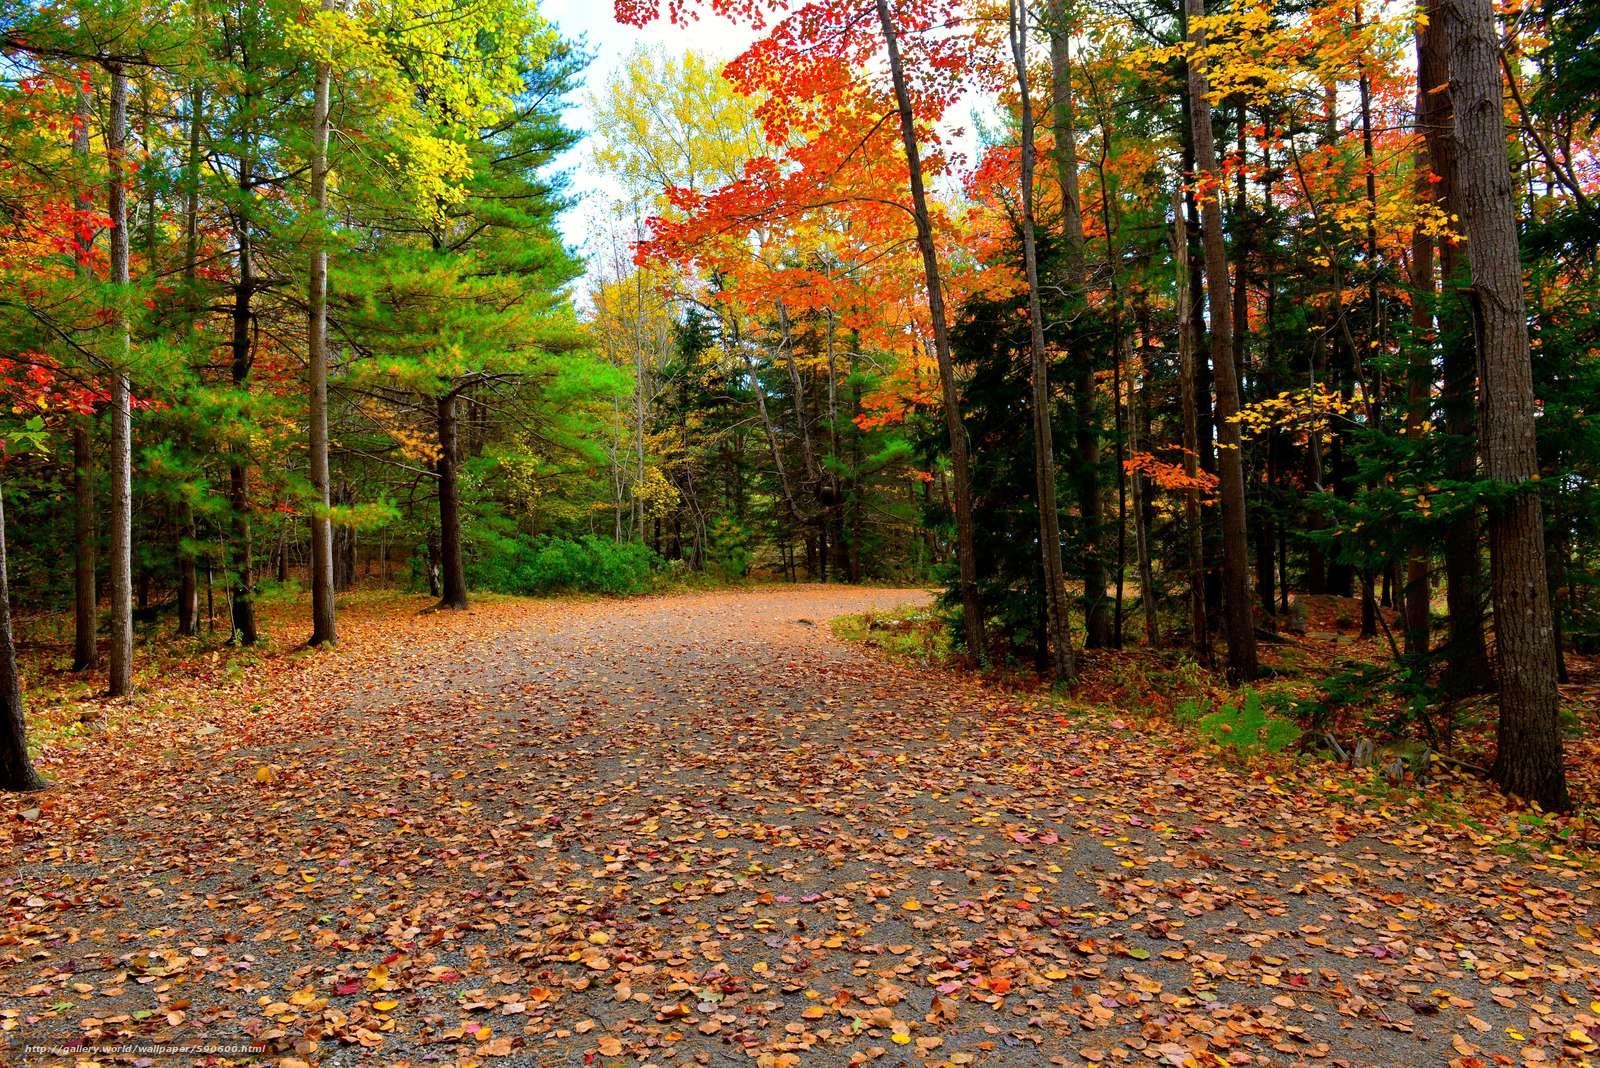 Download wallpaper Acadia National Park autumn road trees 1600x1068